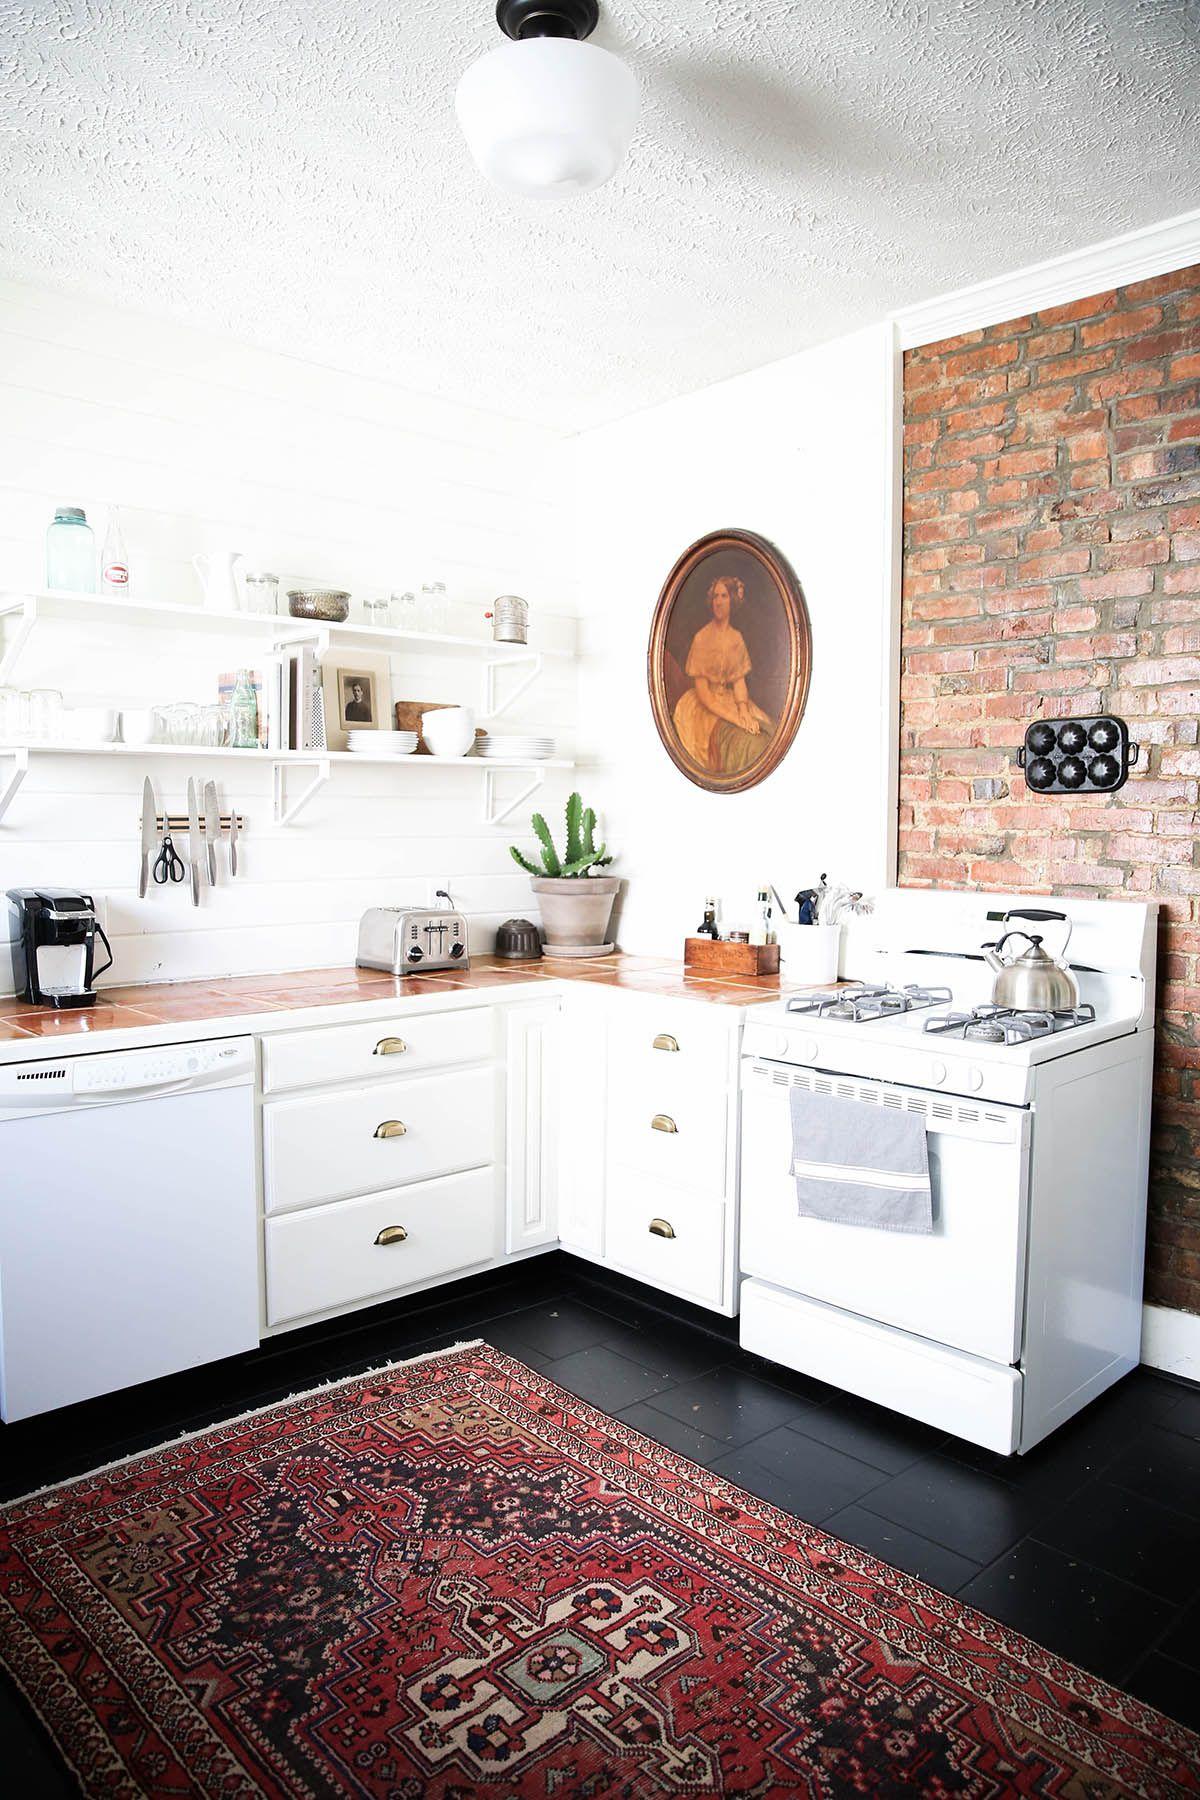 Minimal Rustic Antique Home Decor, Kitchen Decor Idea, McCarn Airbnb In  Nashville, Kitchen